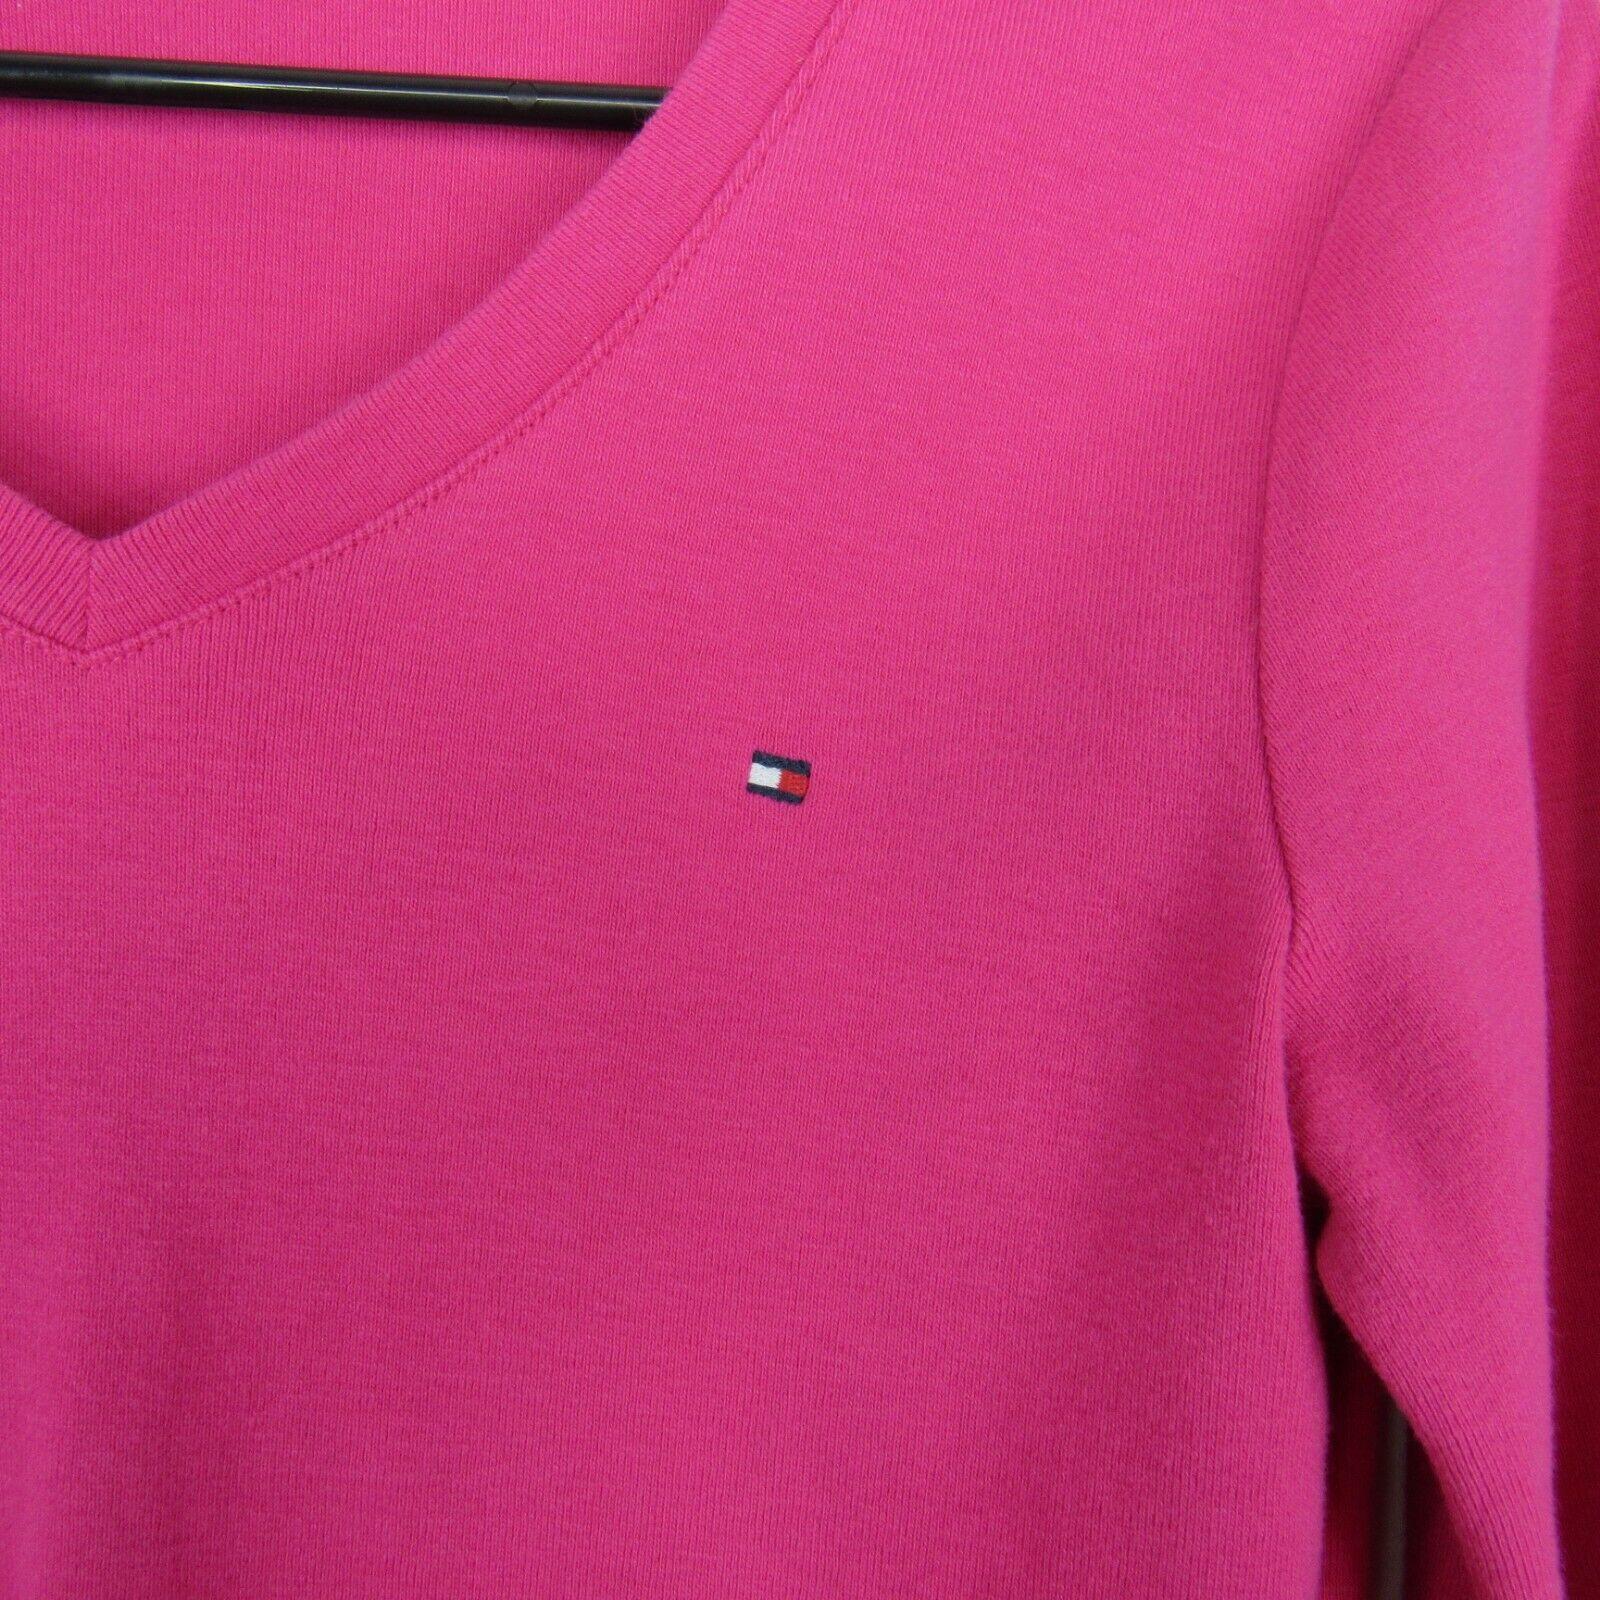 Tommy Hilfiger Womens Size Medium Long Sleeve VNe… - image 3